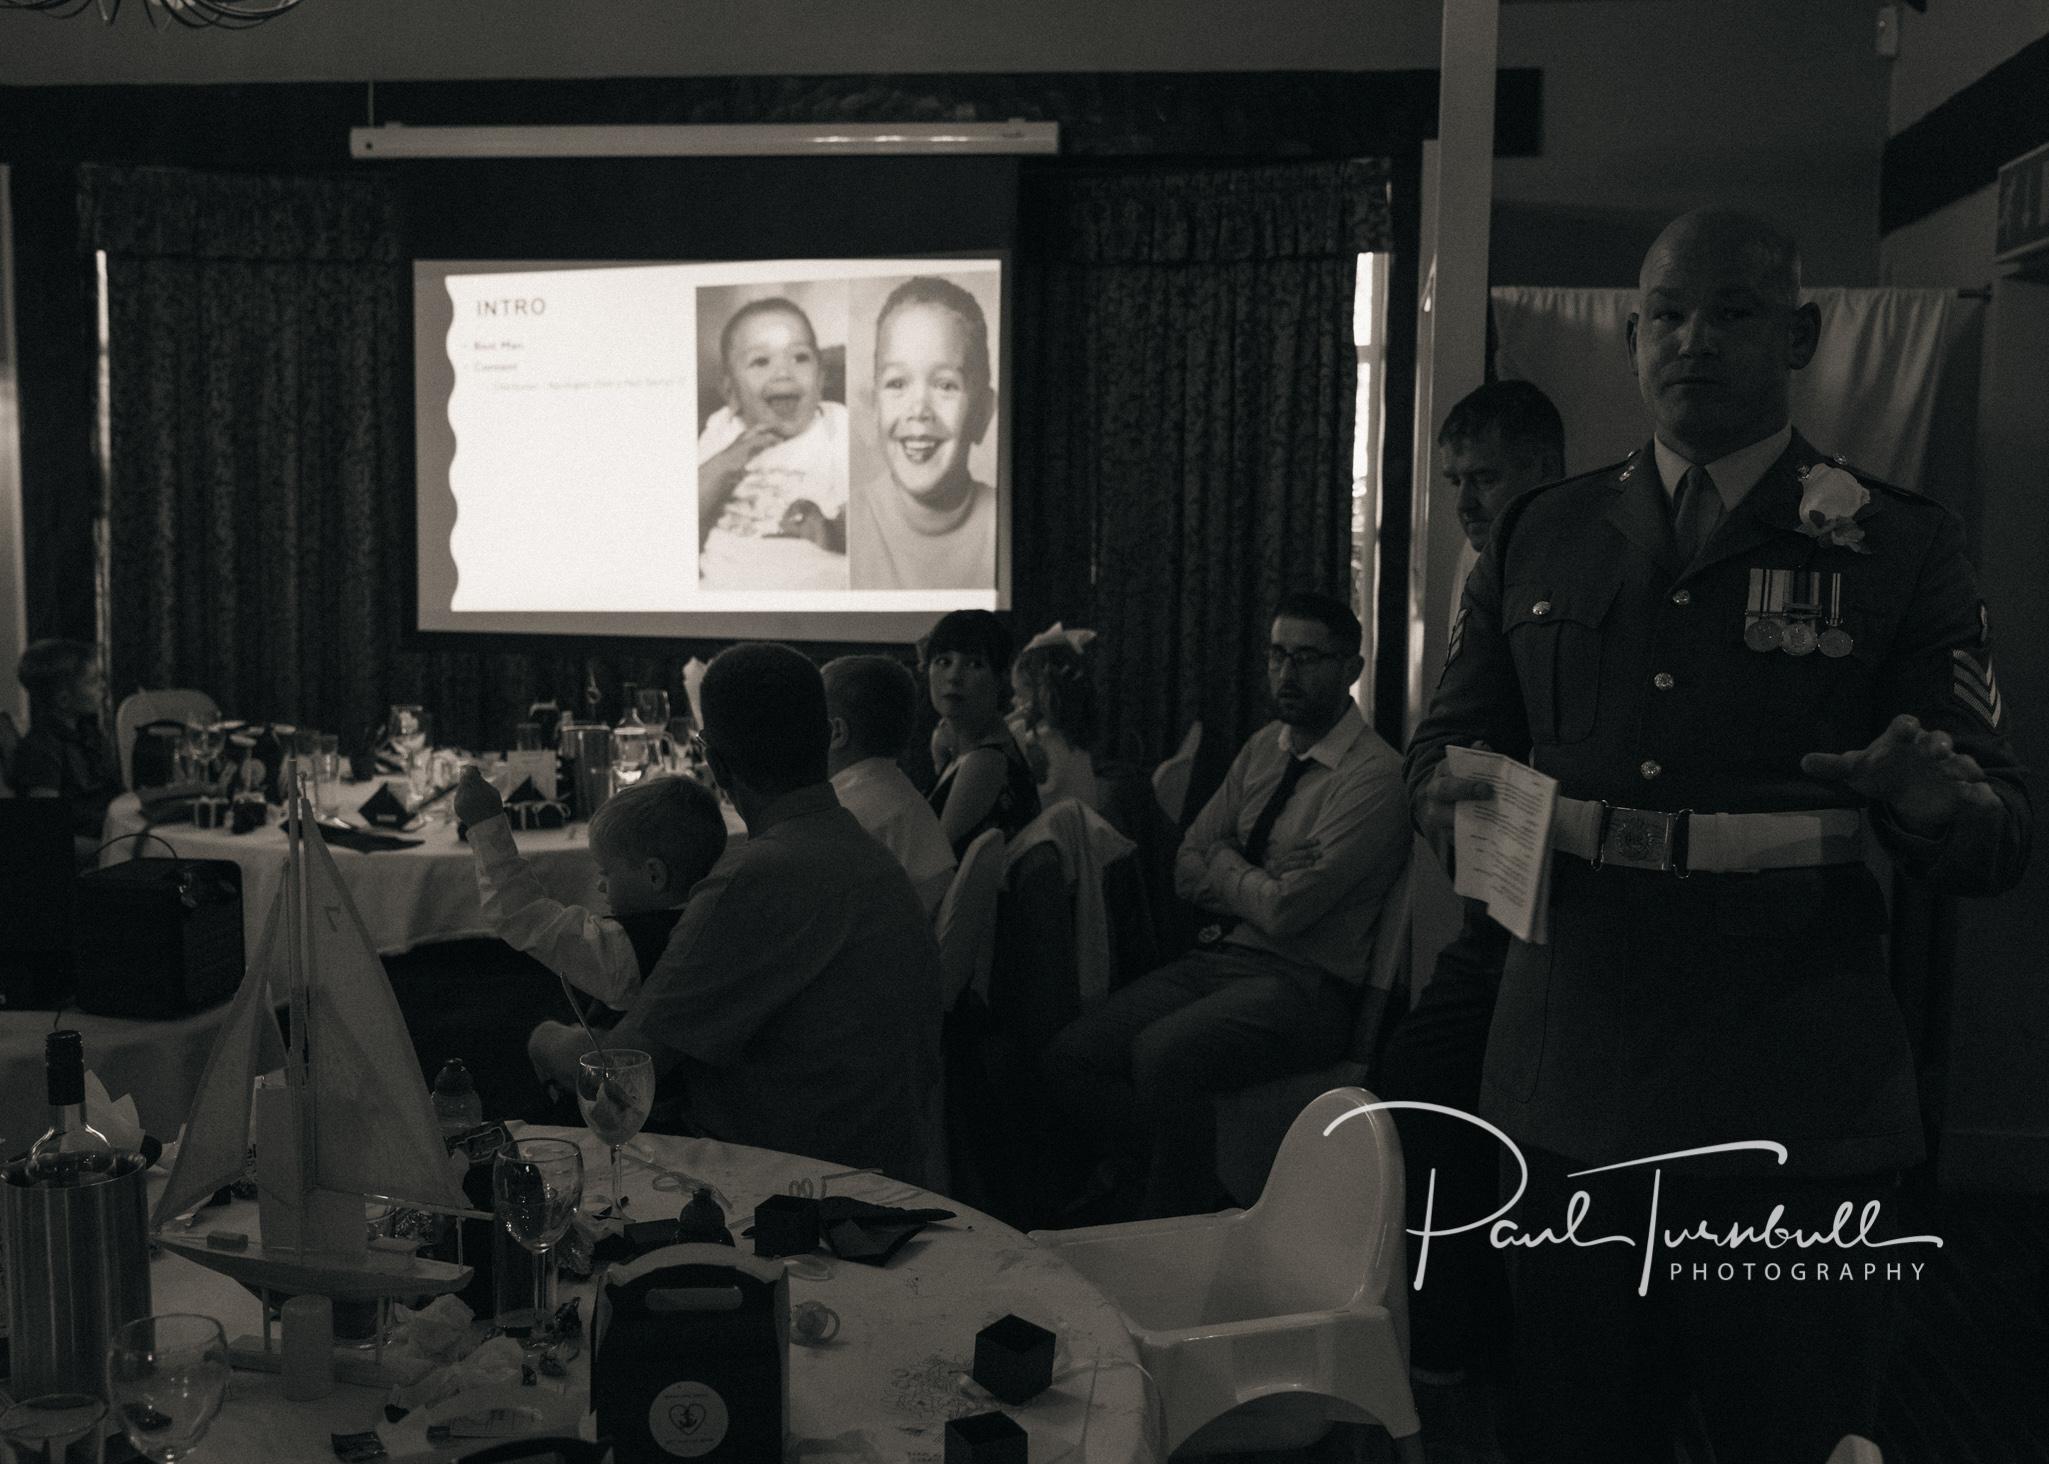 wedding-photographer-south-dalton-walkington-yorkshire-emma-james-065.jpg